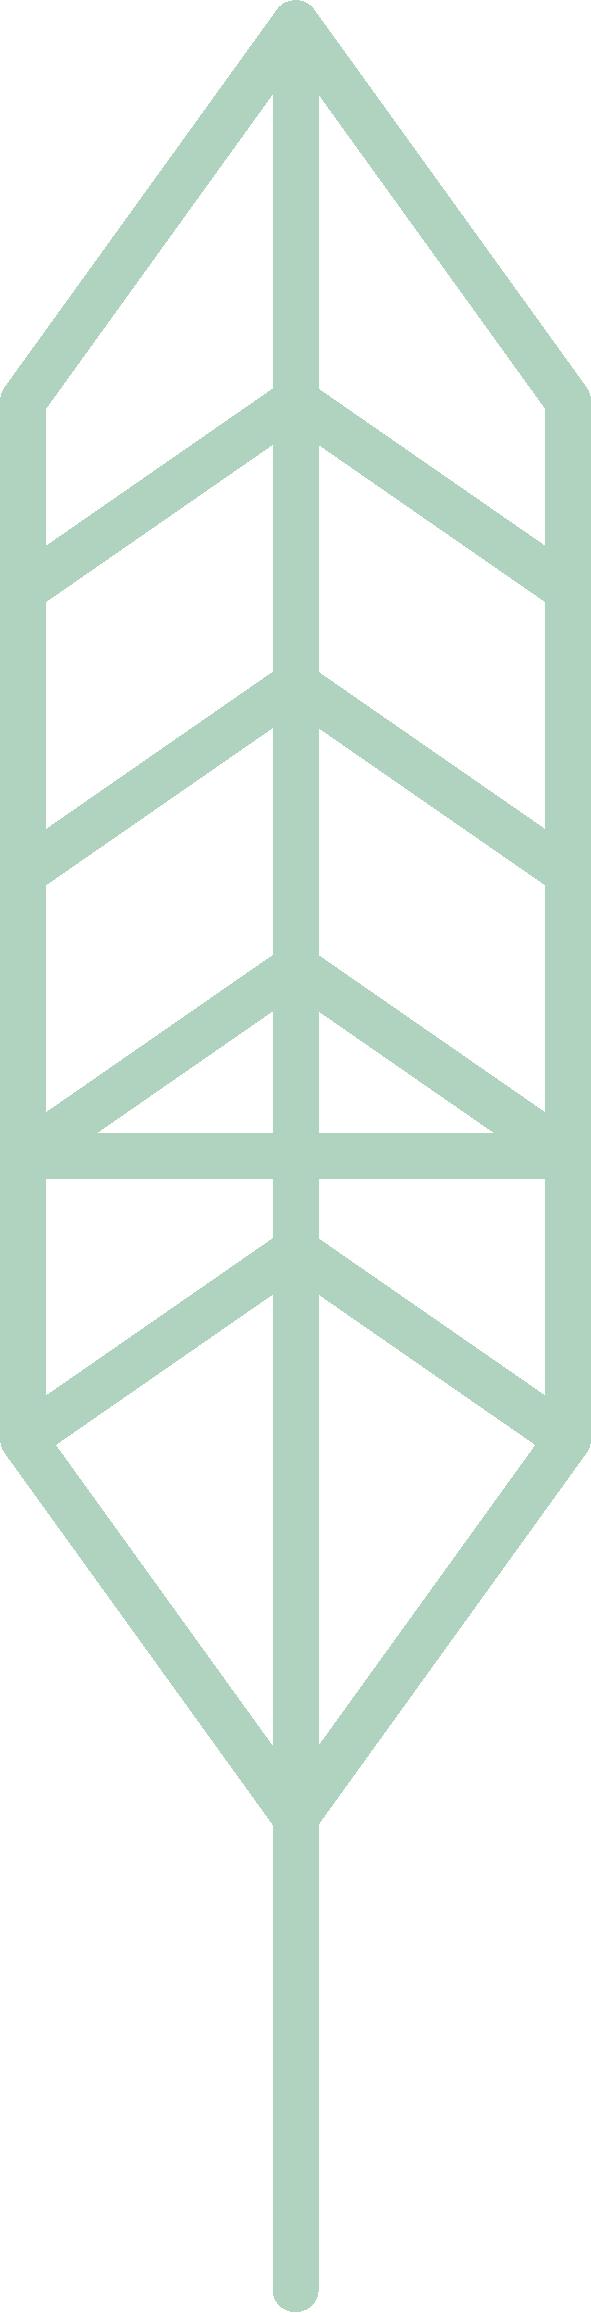 JP_Leaf_Green.png